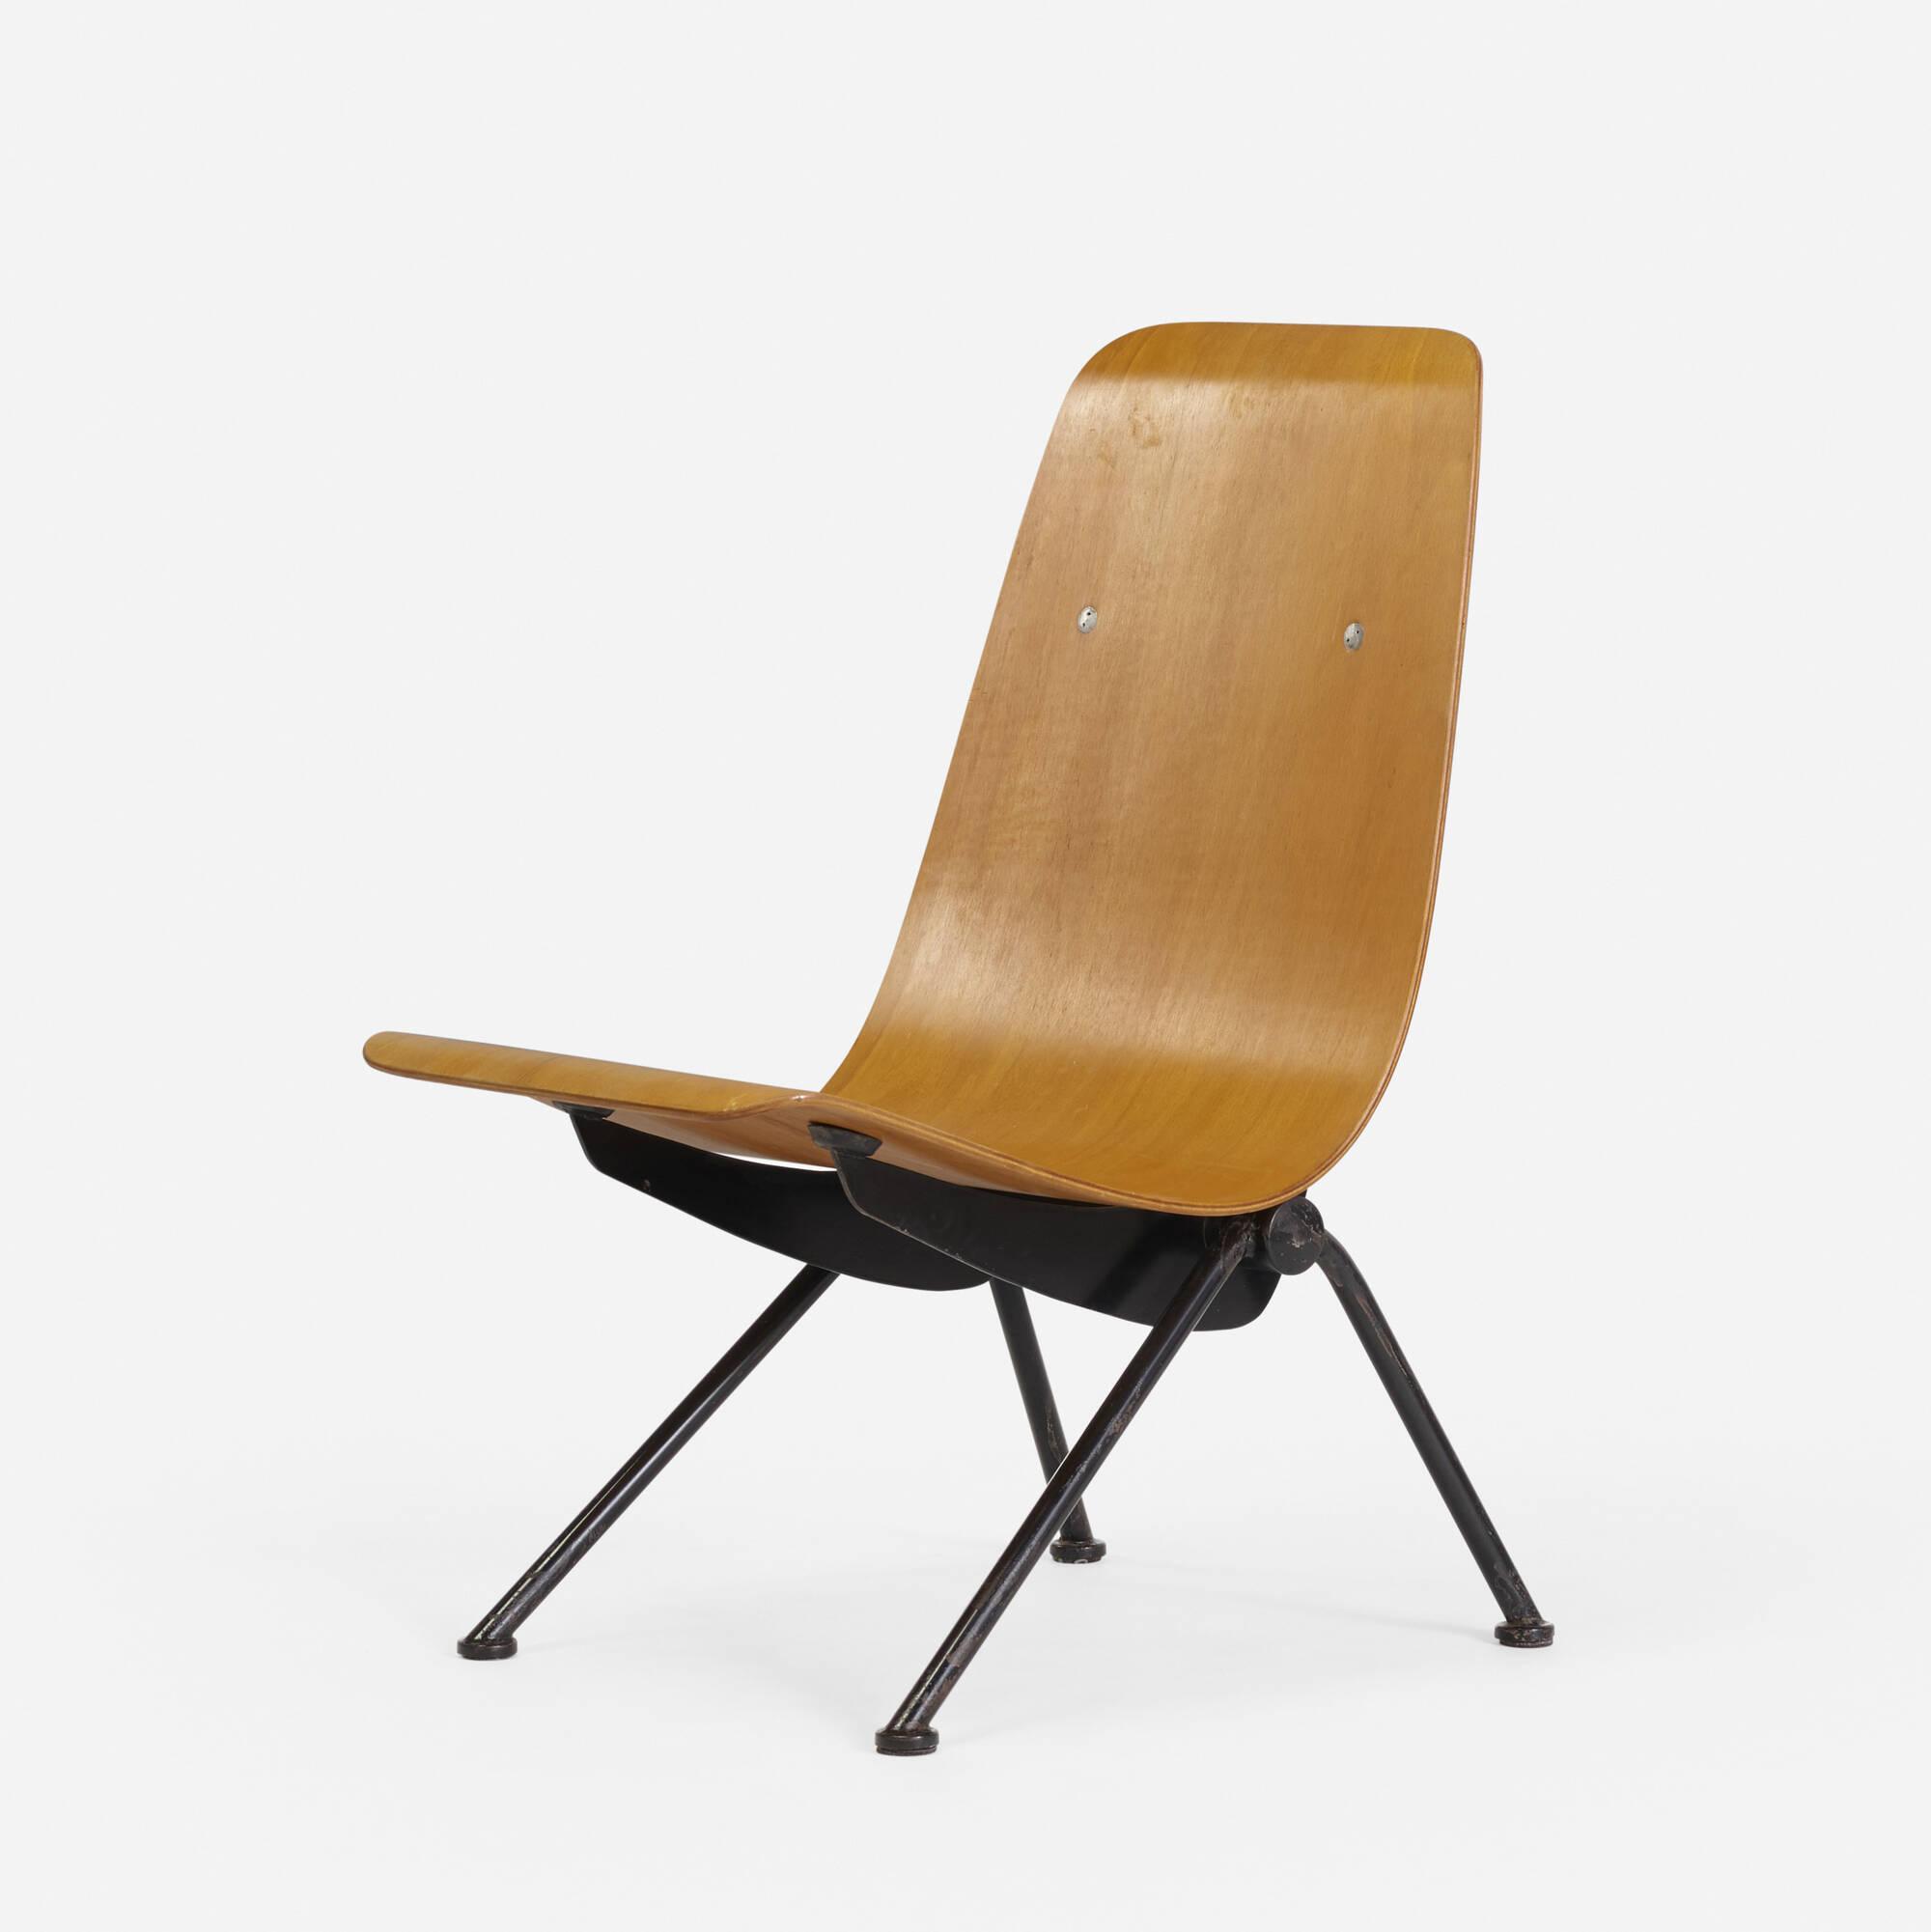 176 JEAN PROUV Antony chair no 356